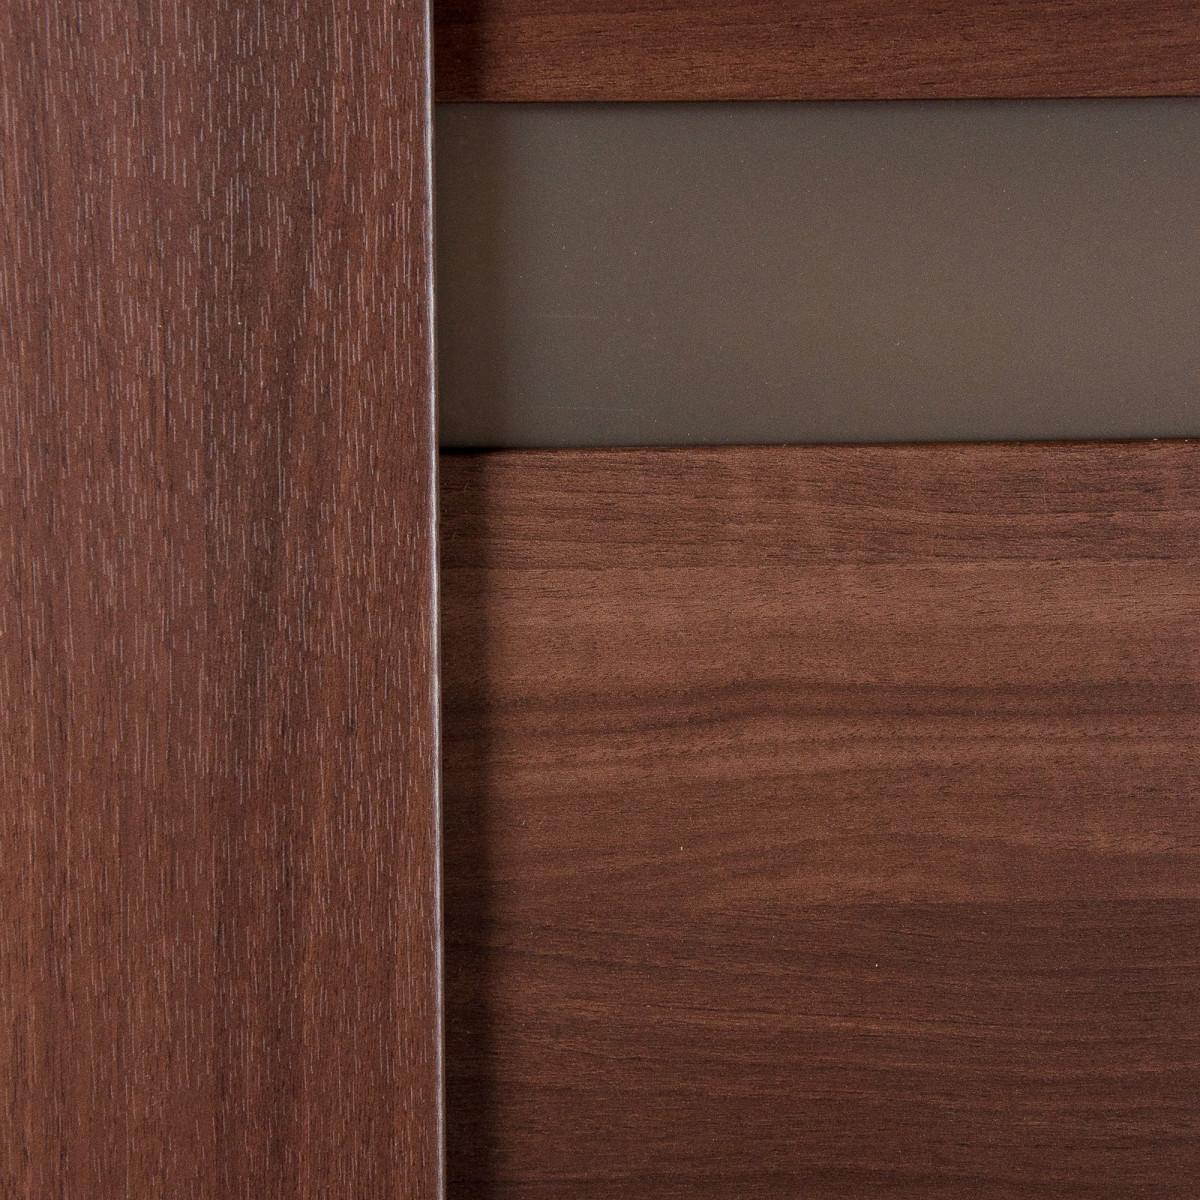 Дверь Межкомнатная Глухая Artens Велдон 70x200 Цвет Мокко/Бронза Без Фурнитуры